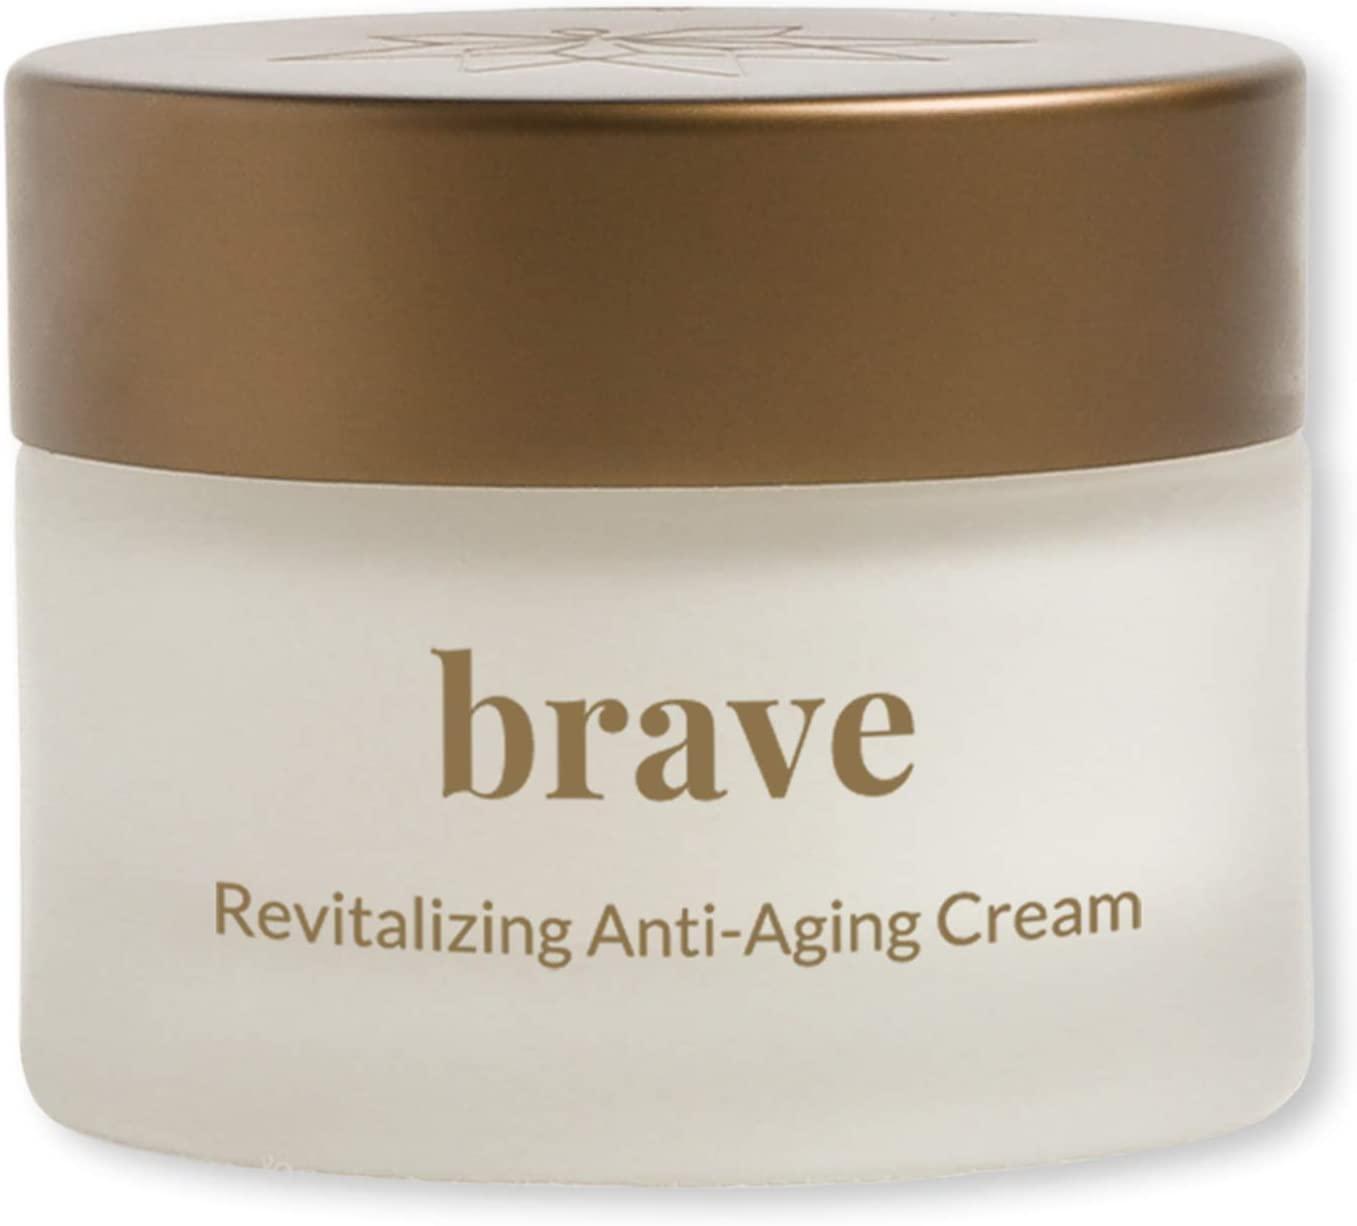 crema-anti-age-nordic-cosmetics-brave.jpg